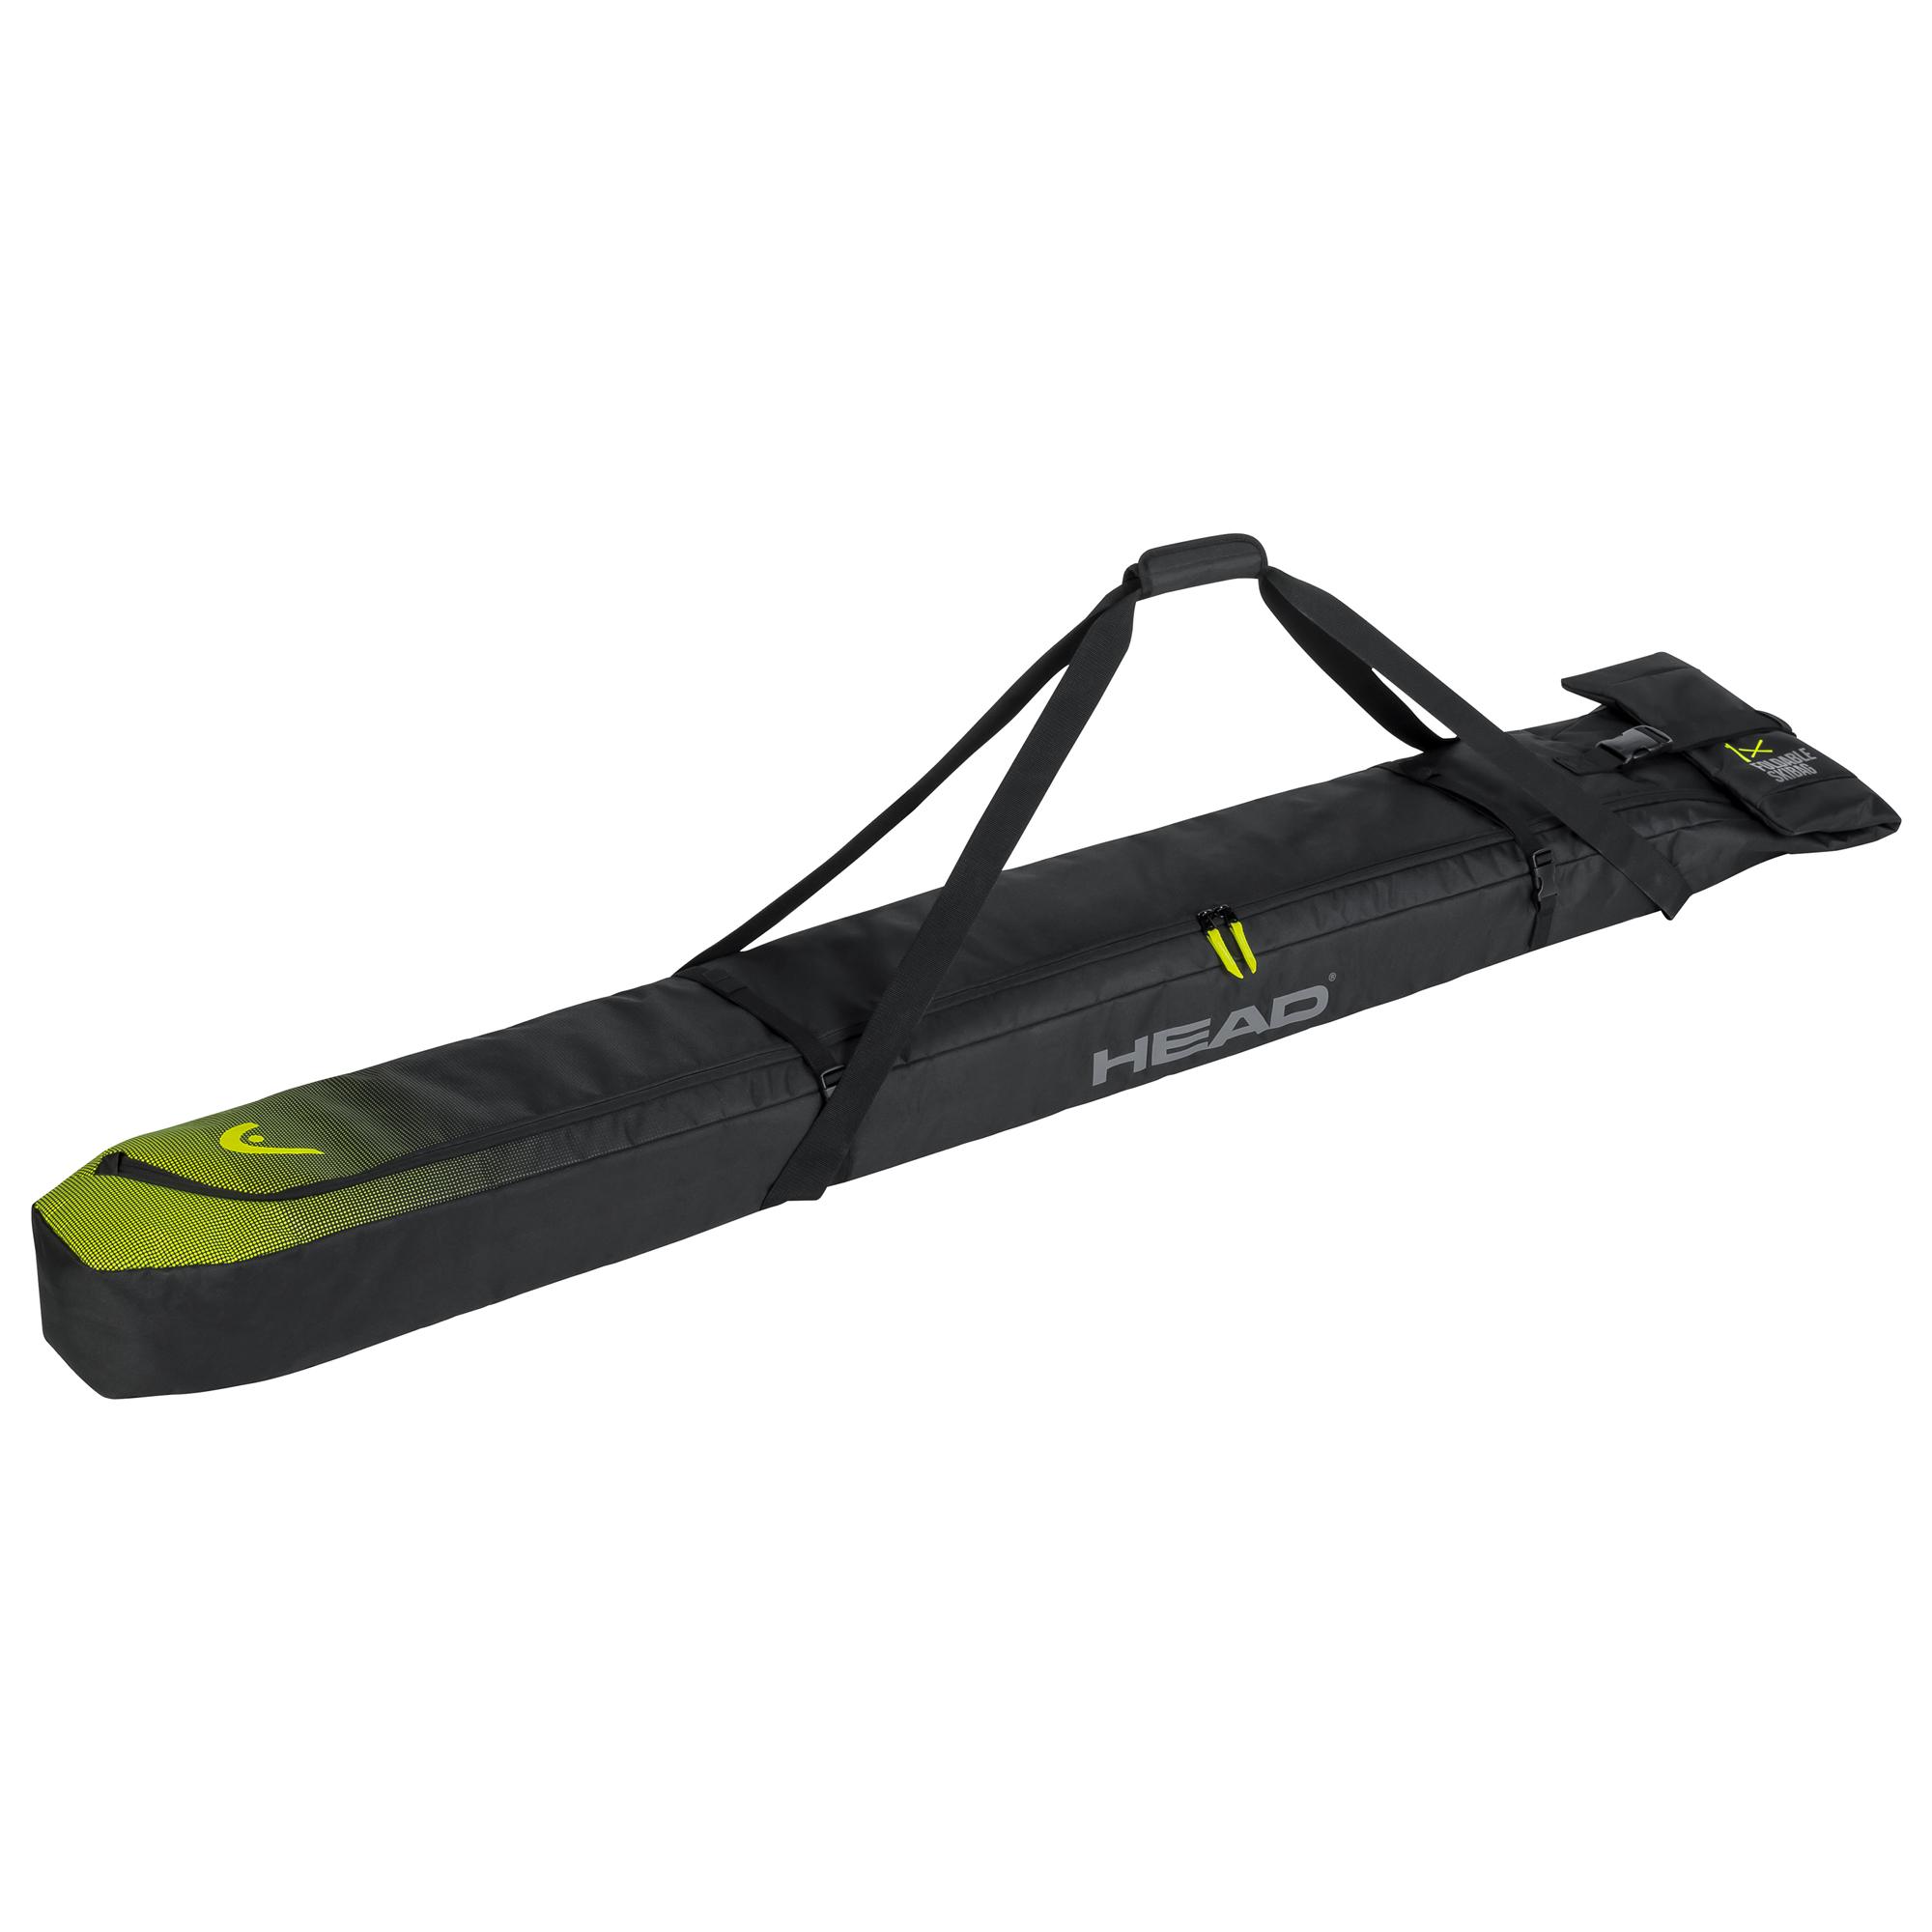 Sac à ski HEAD Allride Simple Noir et Jaune